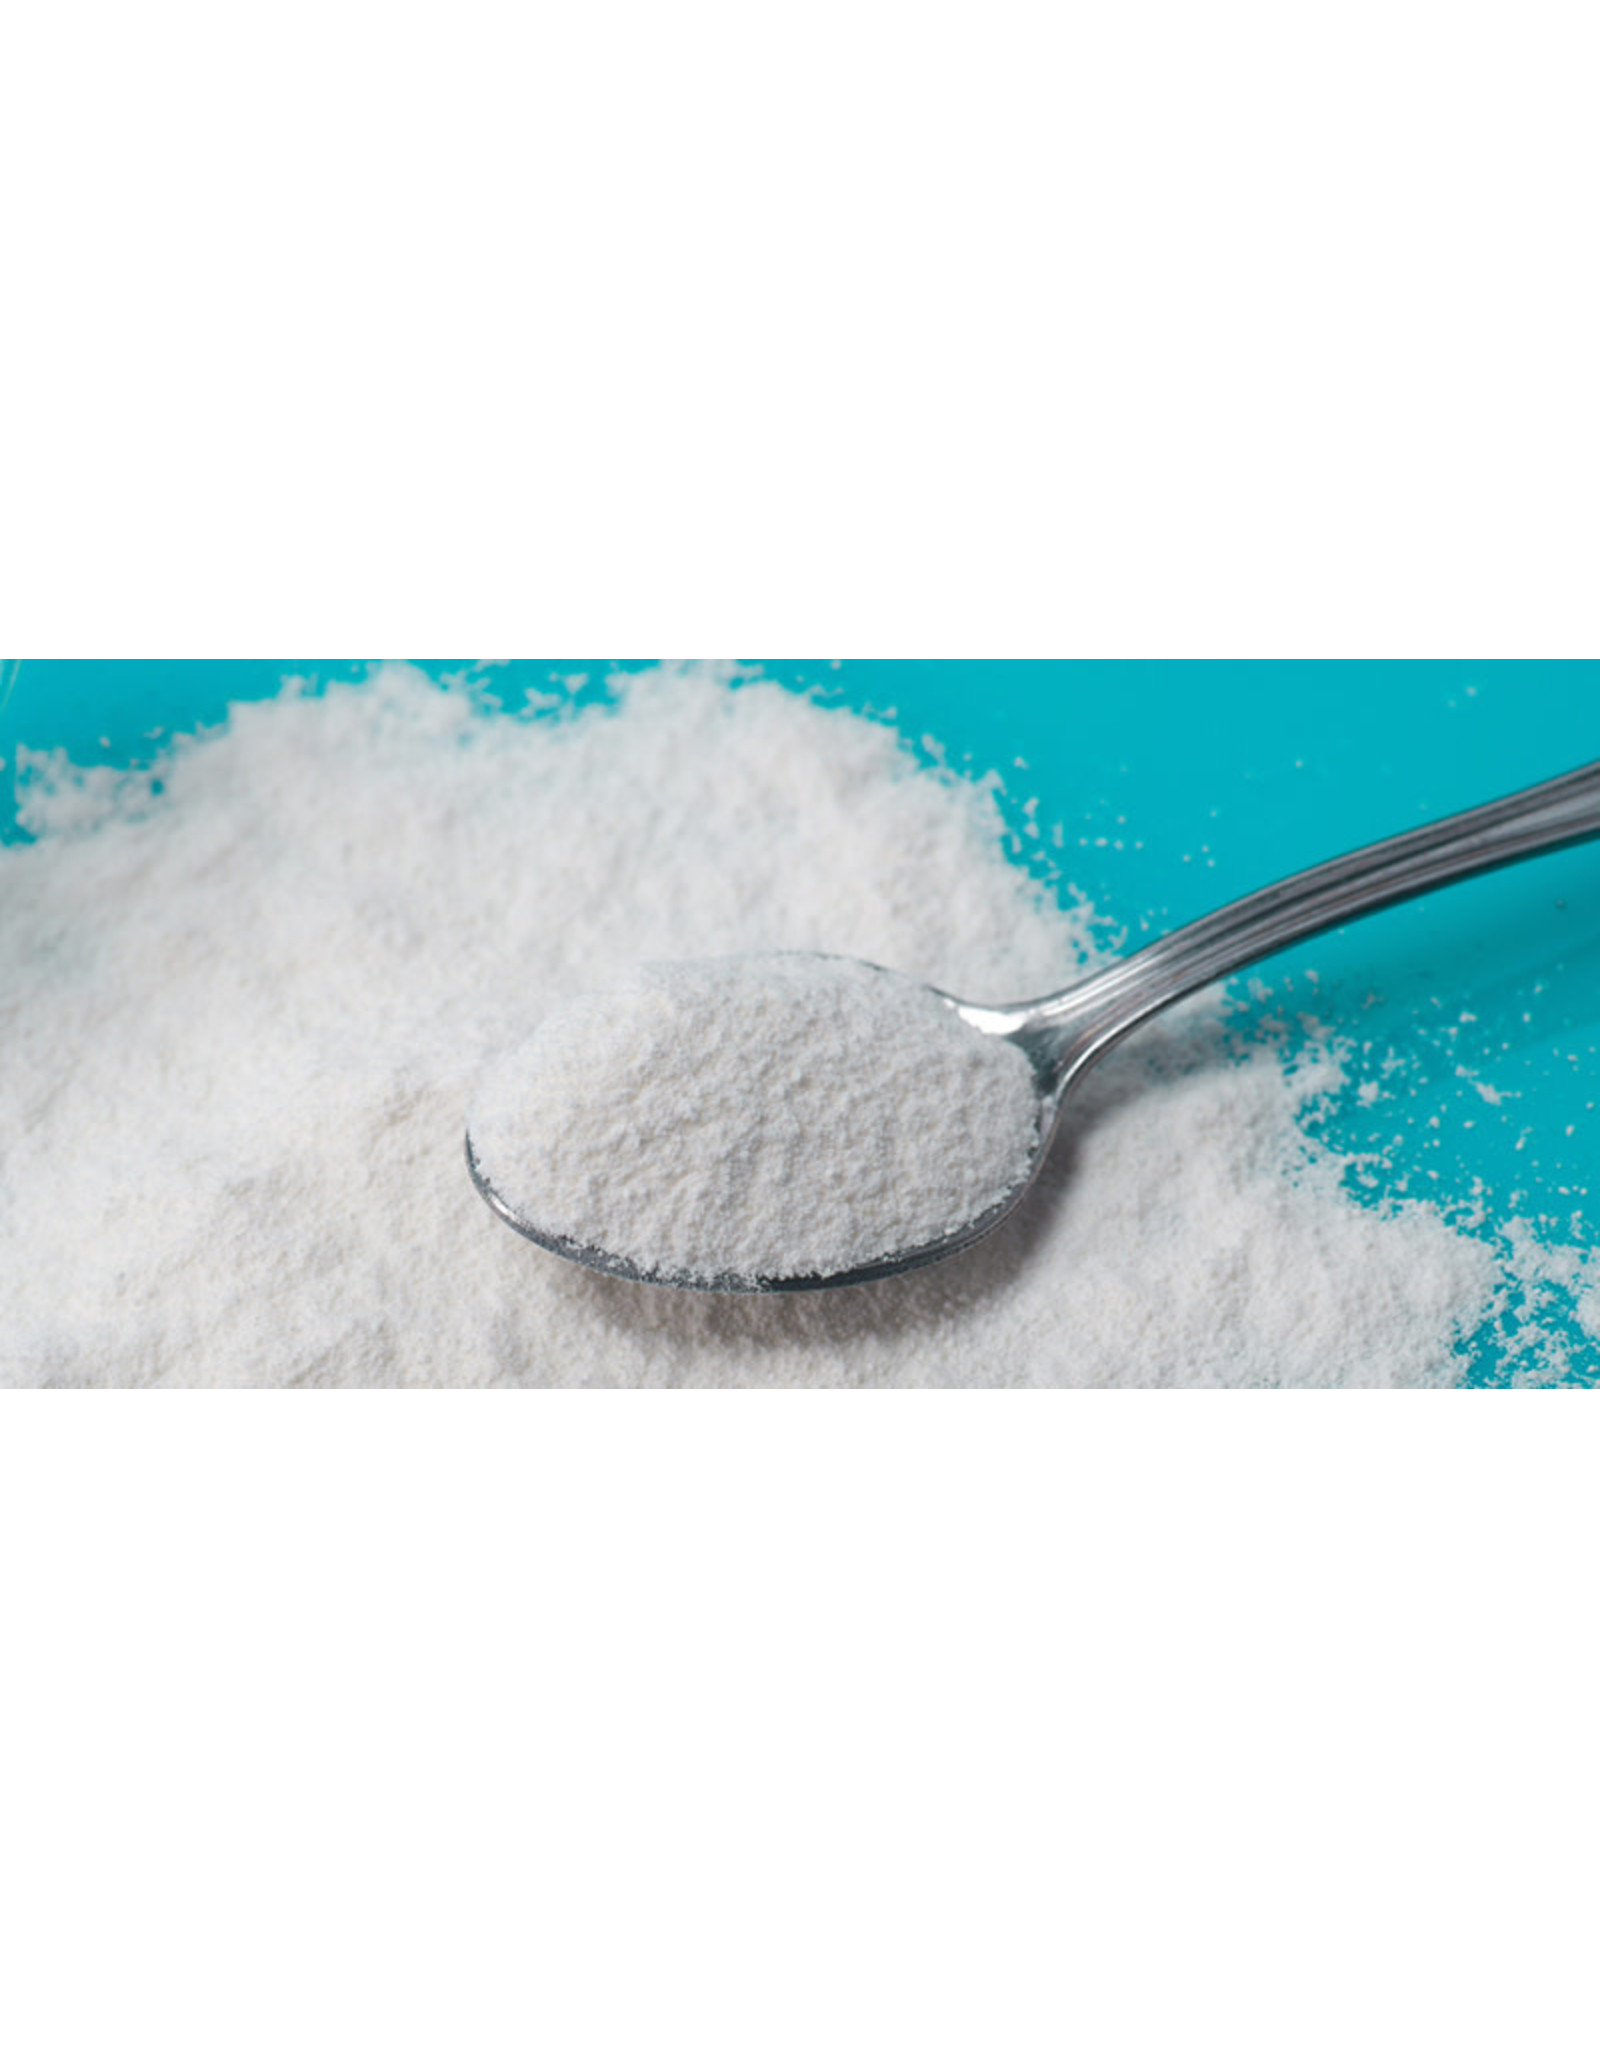 4.5oz  Priming Sugar Dextrose Corn Sugar Prime